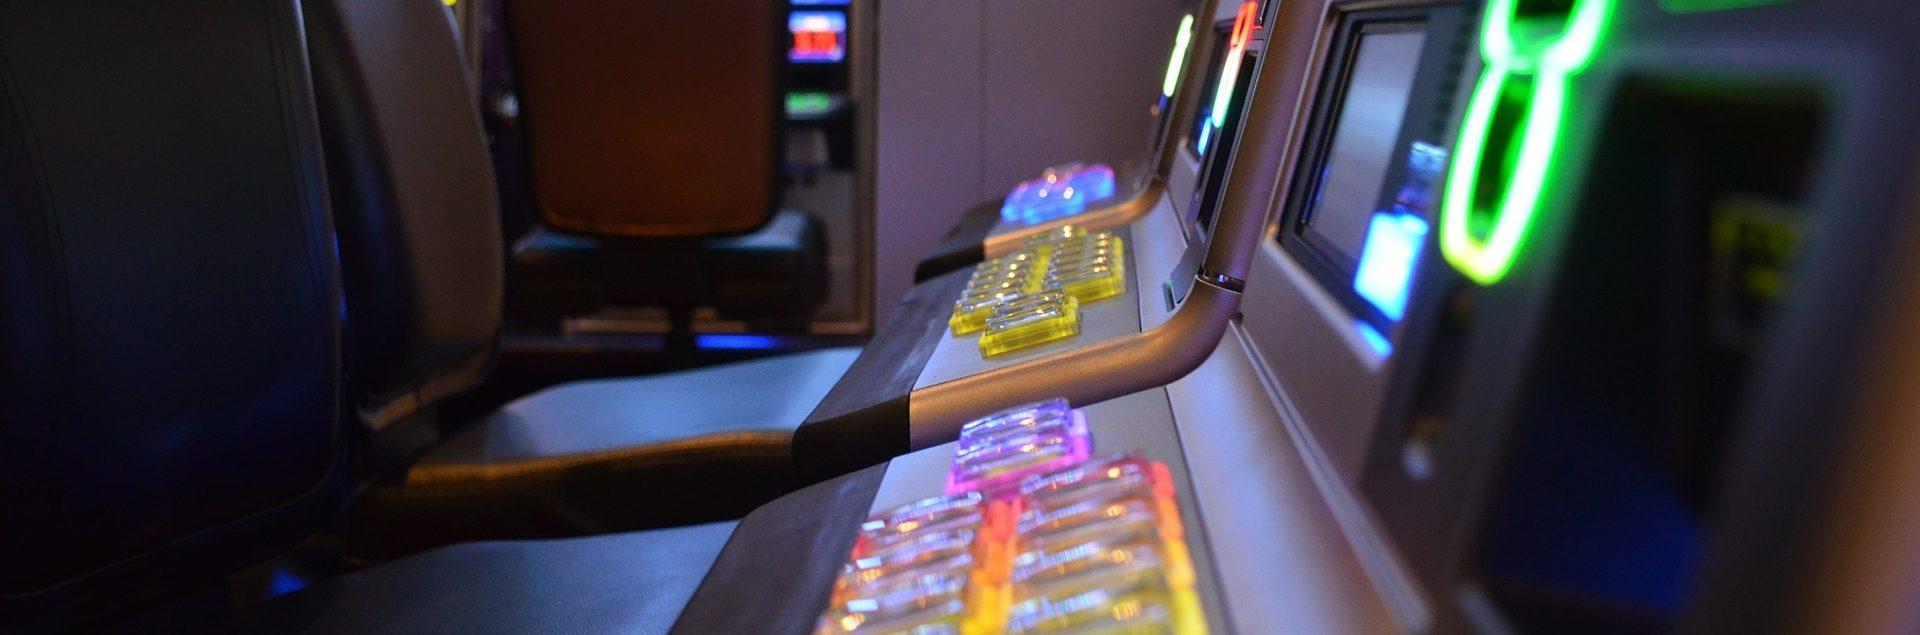 slot-machine-358248_1920